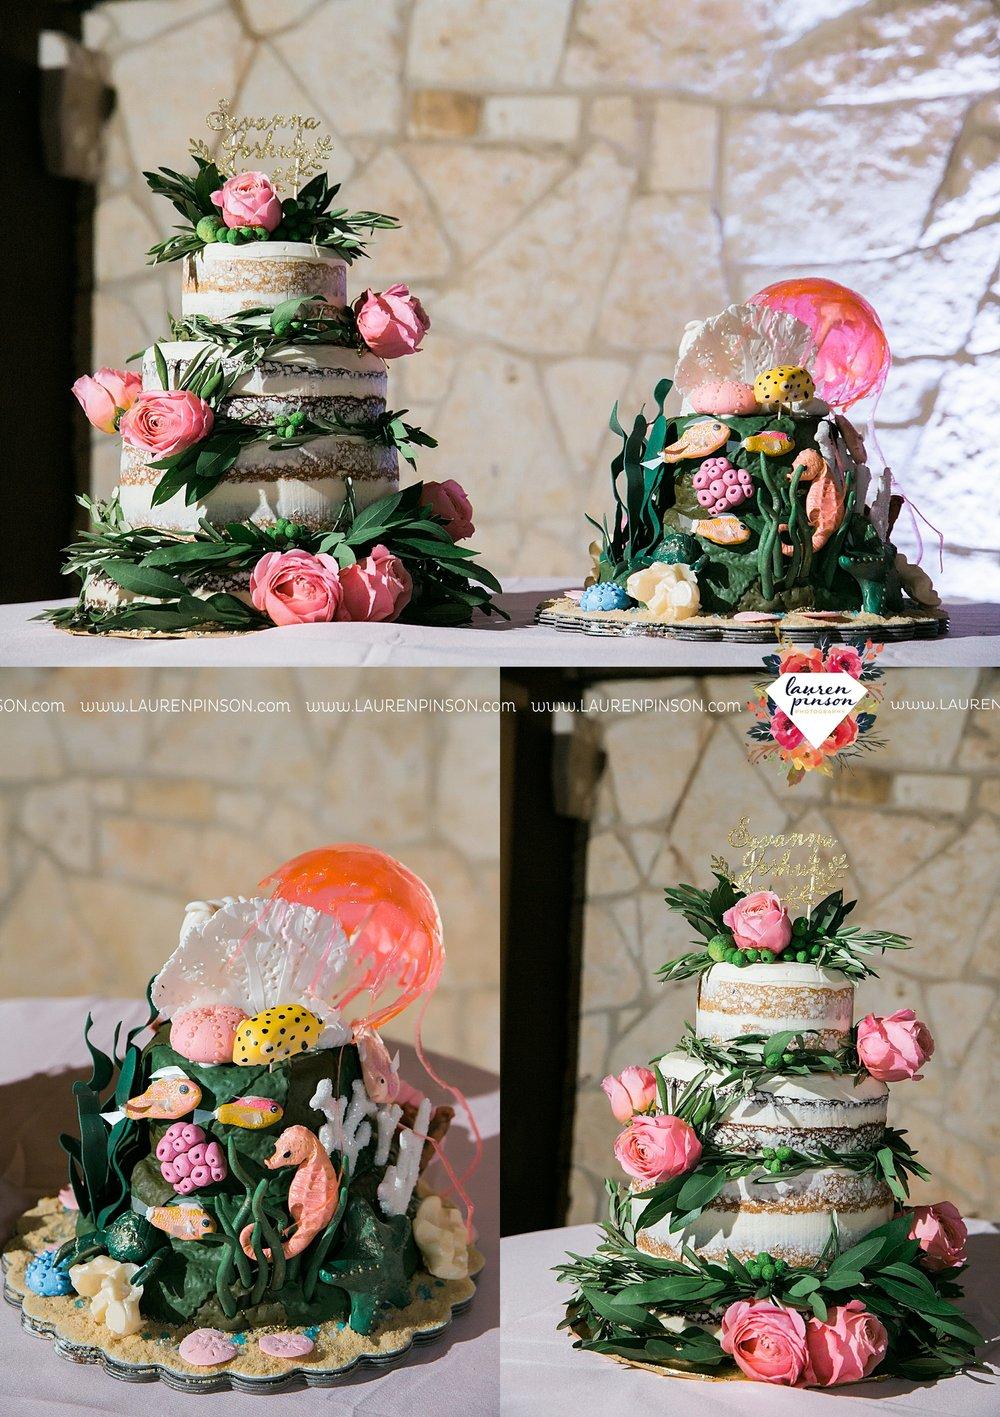 austin-texas-barn-wedding-at-brodie-homestead-wichita-falls-tx-wedding-photographer-dfw-00083.jpg